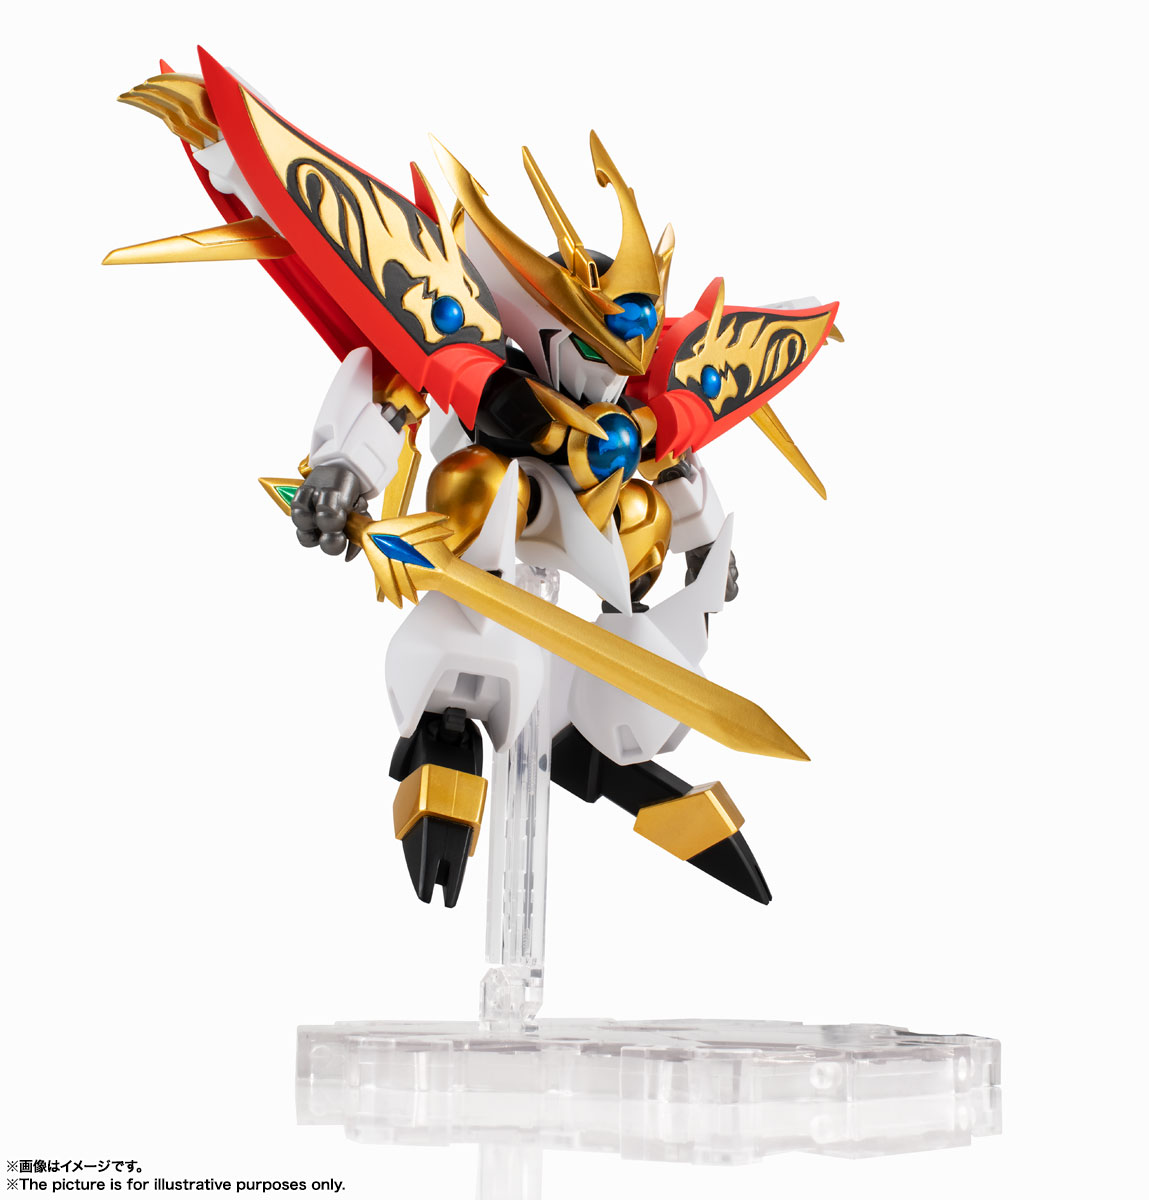 NXEDGE STYLE[MASHIN UNIT]『煌龍丸』魔神英雄伝ワタル 可動フィギュア-004